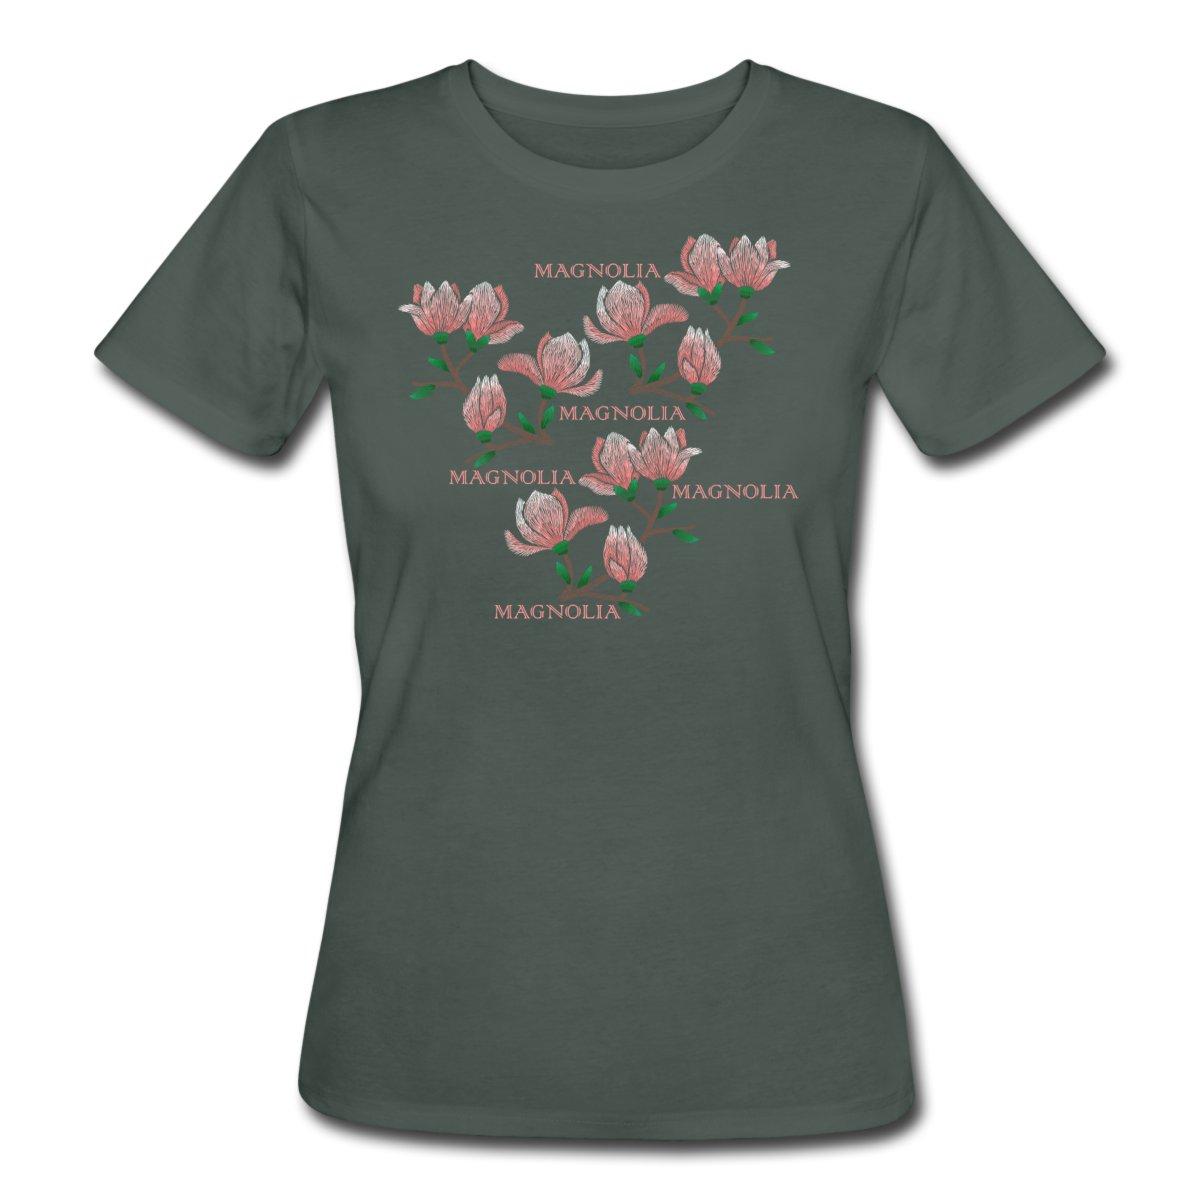 magnolia-ekologisk-t-shirt-dam-mg.jpg